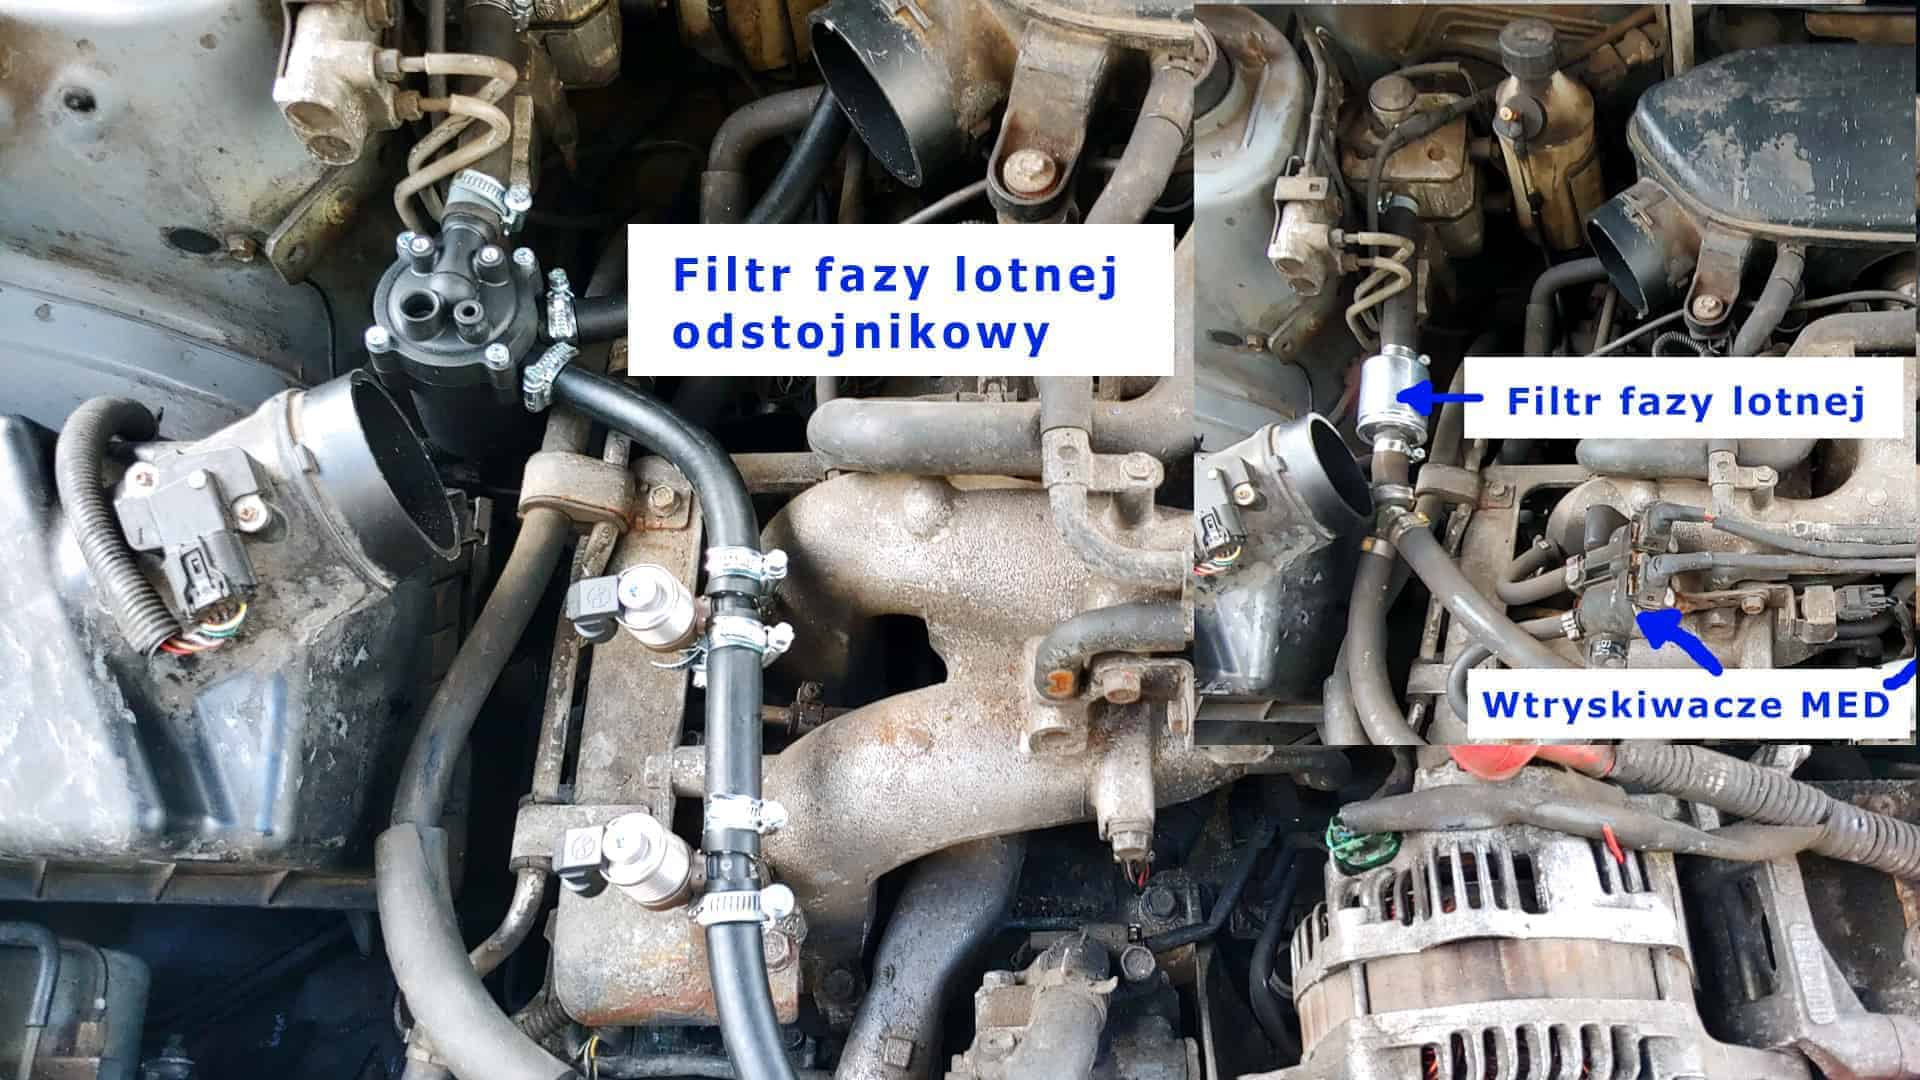 Filtr fazy lotnej Czaja Blaster, filtr odstojnikowy